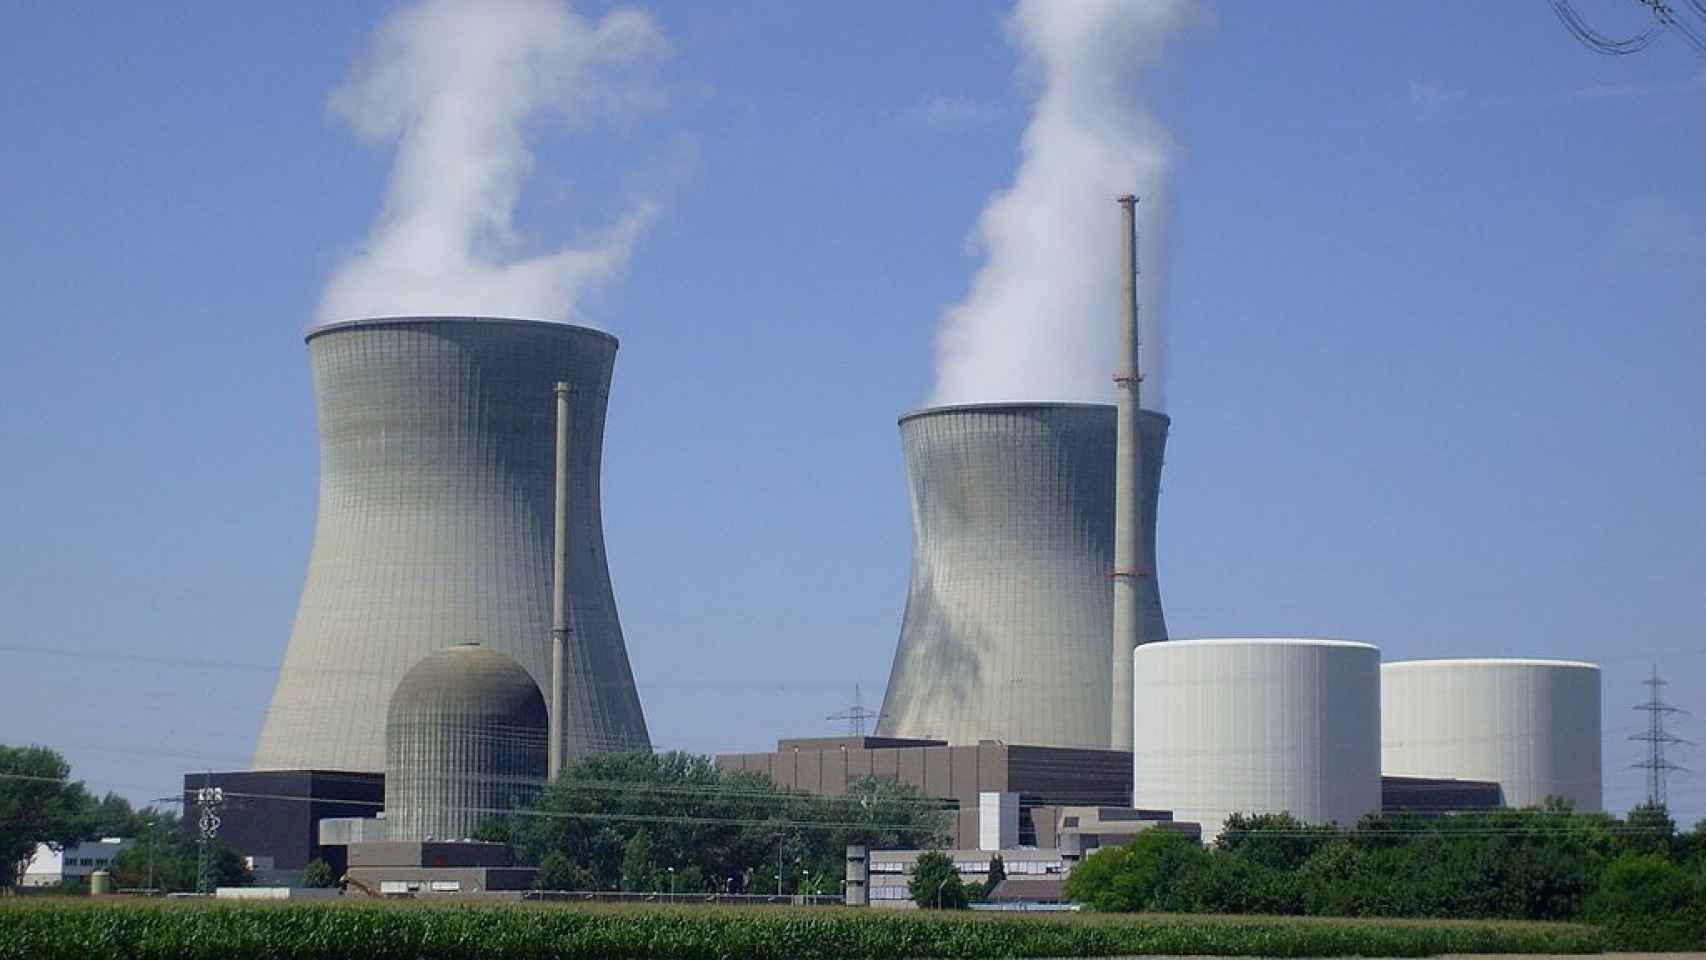 Imagen de la central nuclear de Gundremmingen, en Alemania.